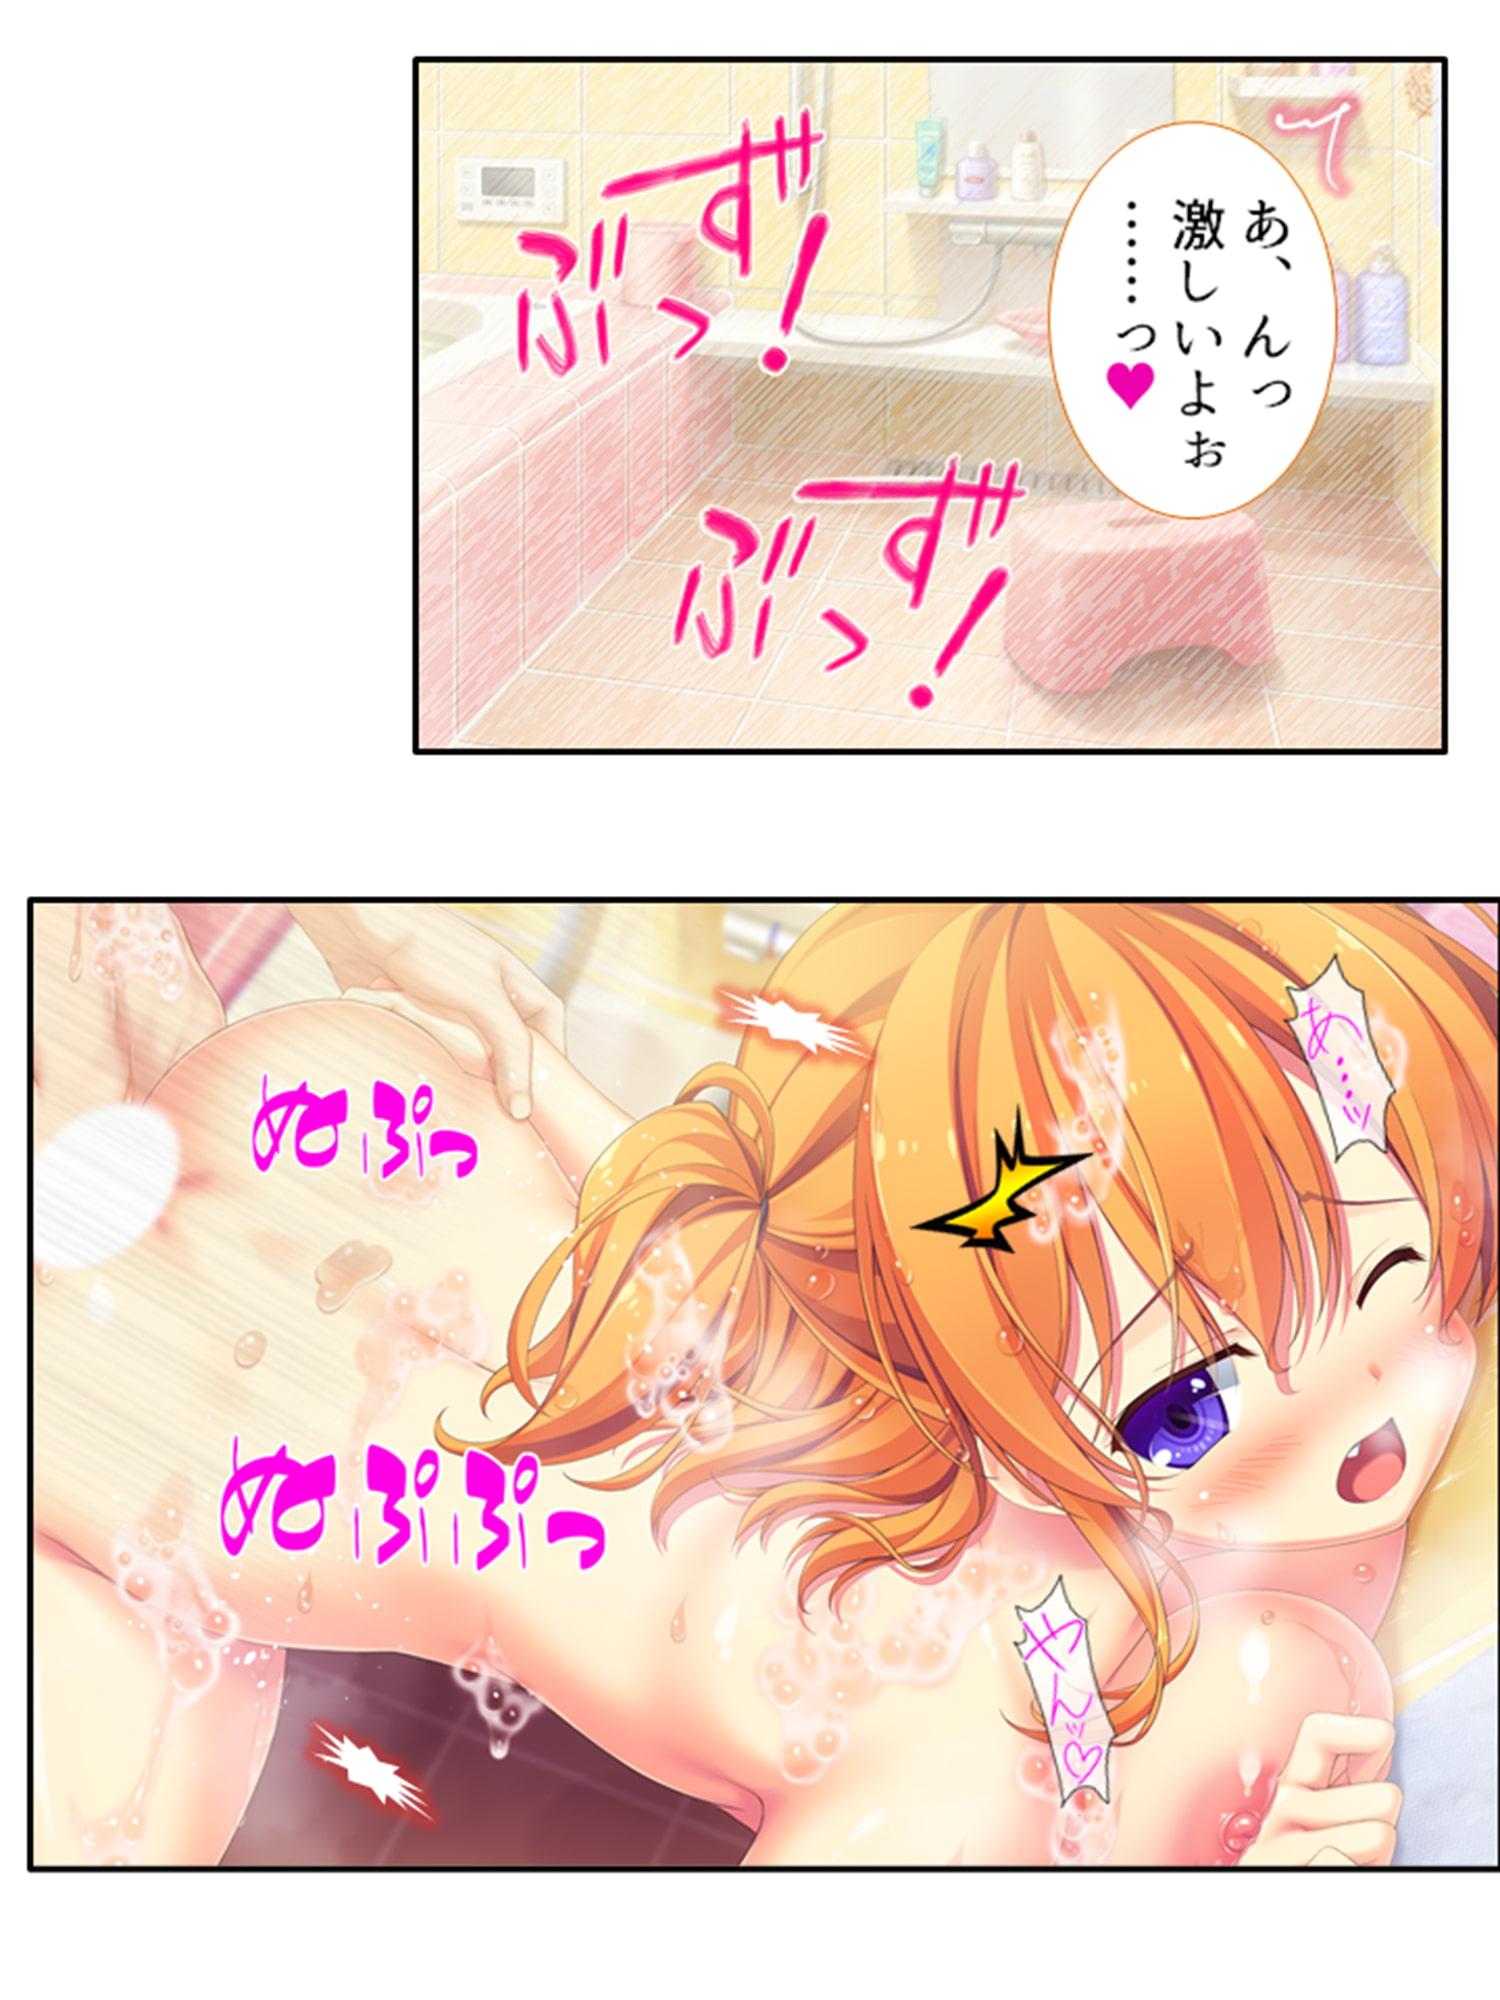 RJ319630 極上夏休み親の居ぬ間に妹が甘えまくって子作り三昧 4巻 [20210307]